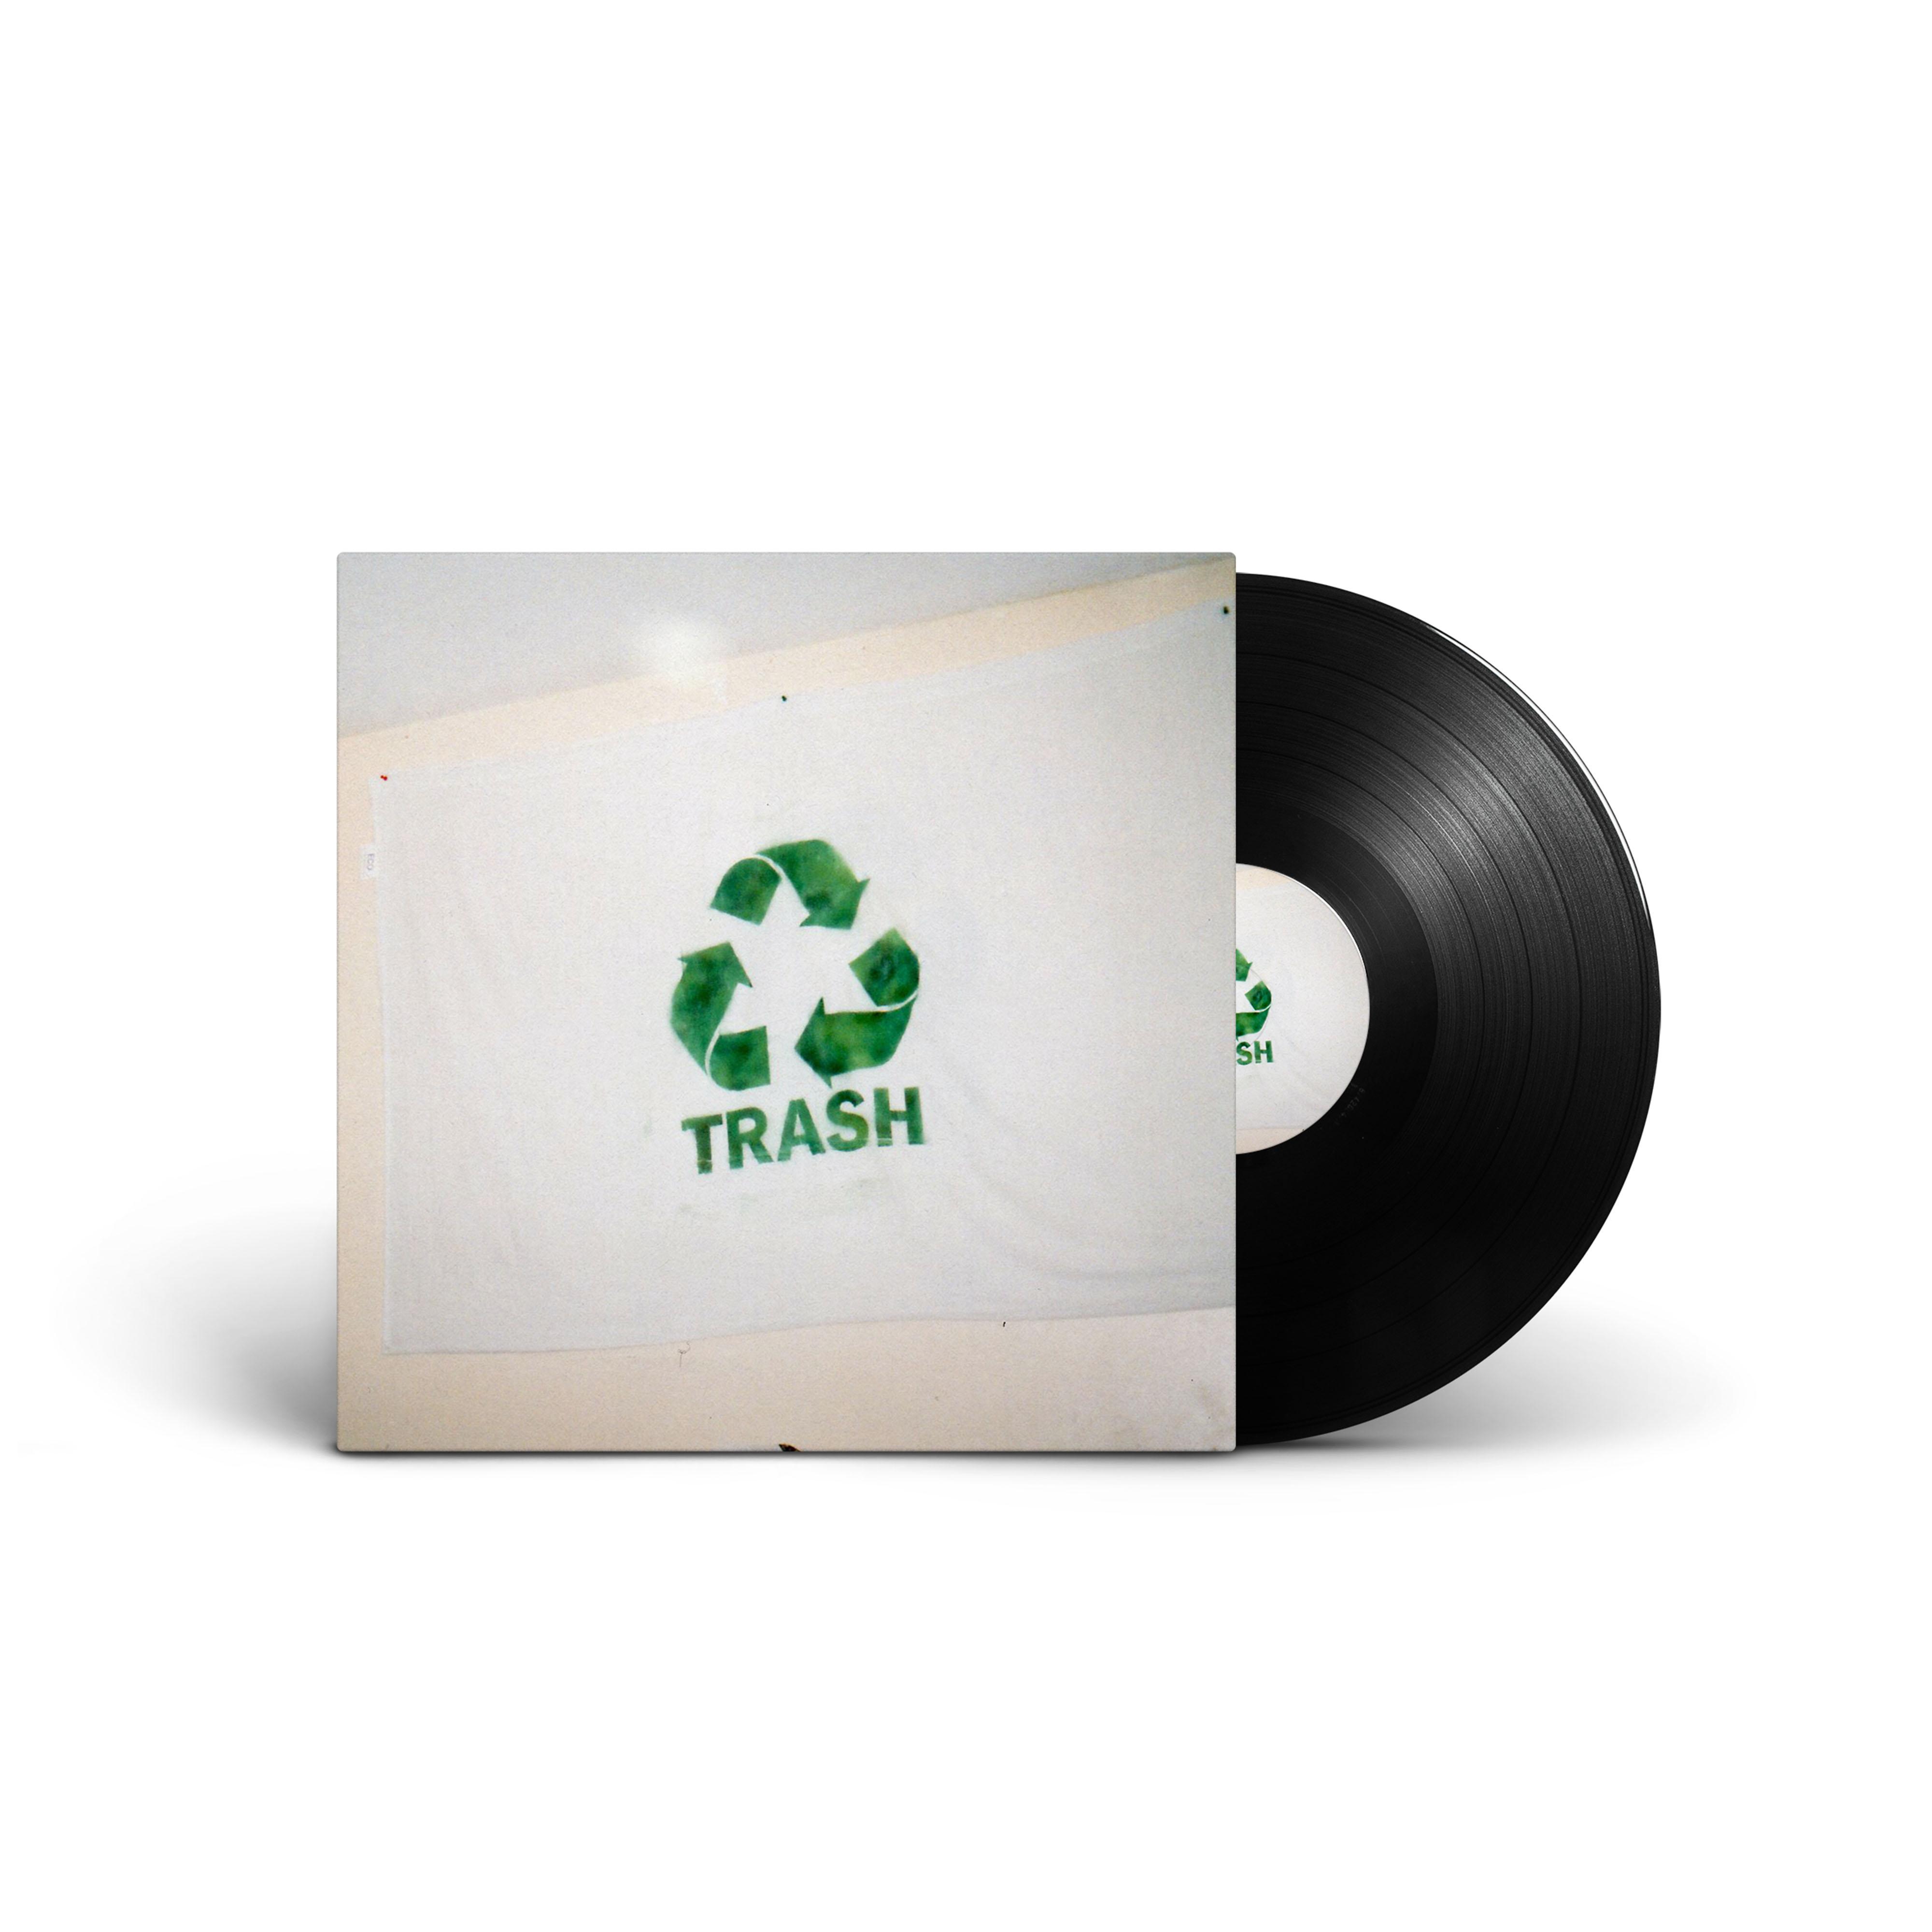 'TRASH' EP [VINYL] - Clue Records